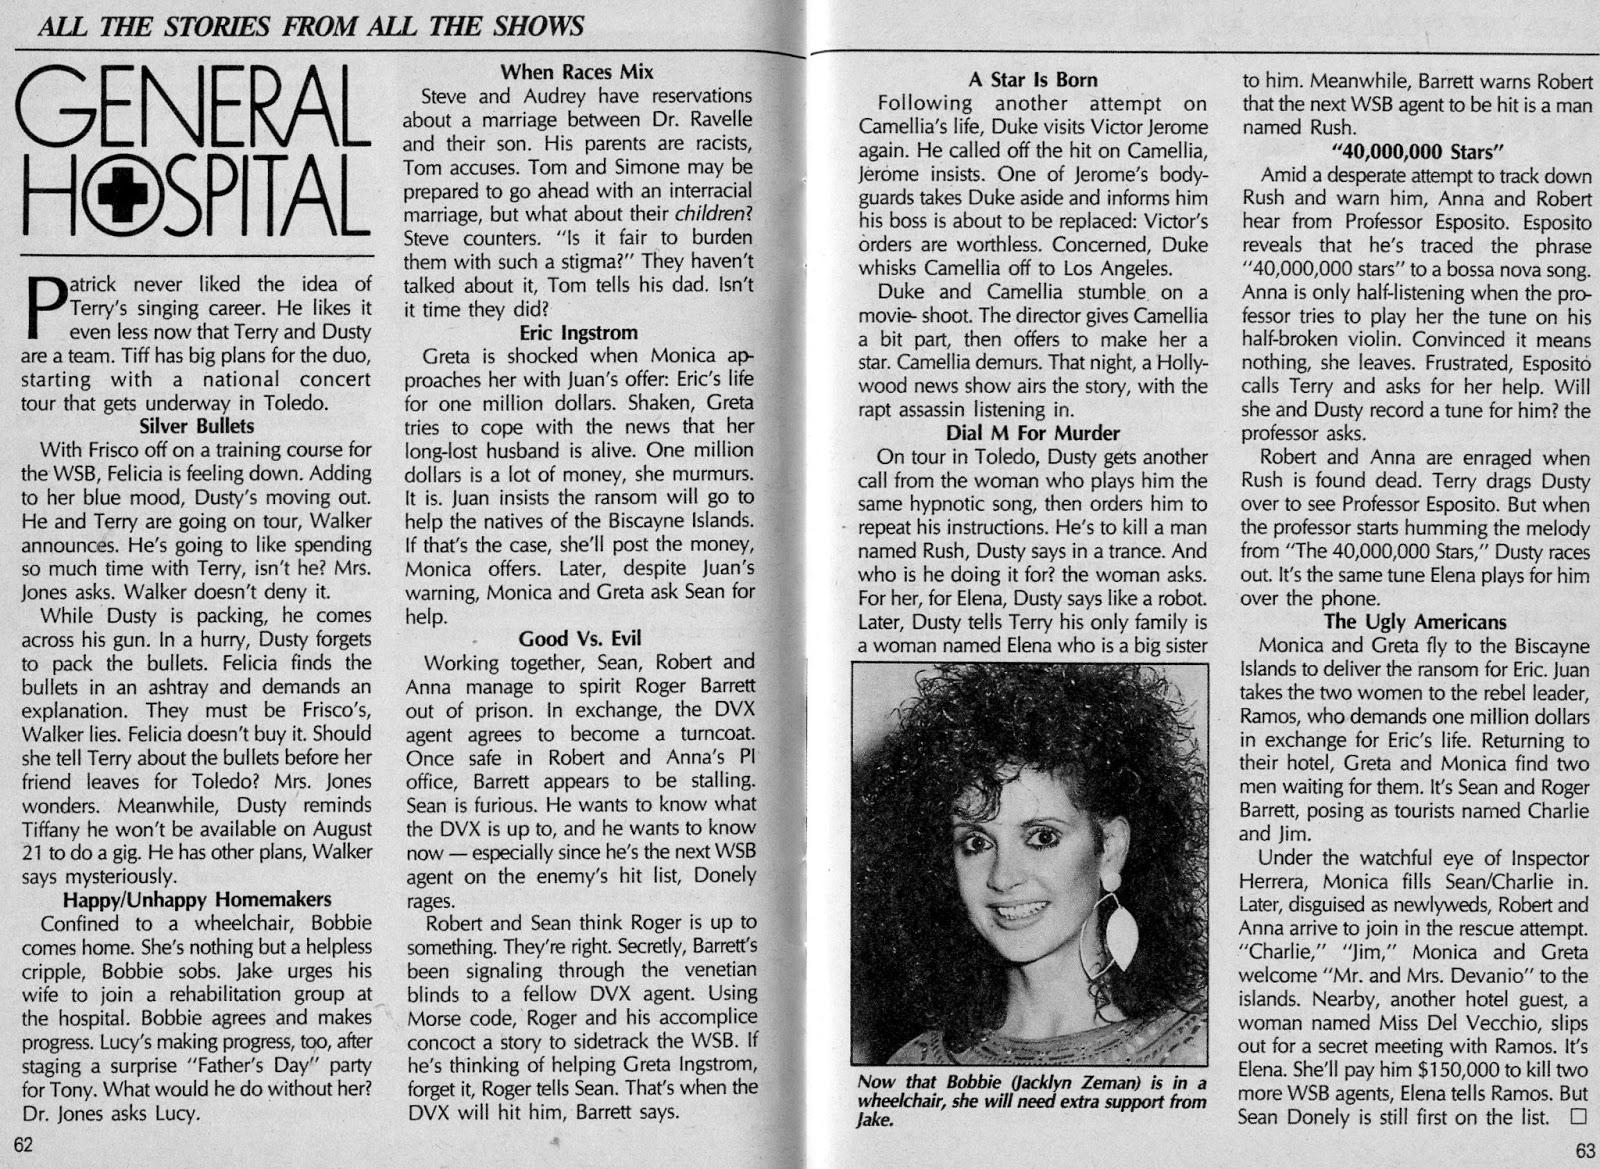 General Hospital Recap-July 28, 1987 (SOD)